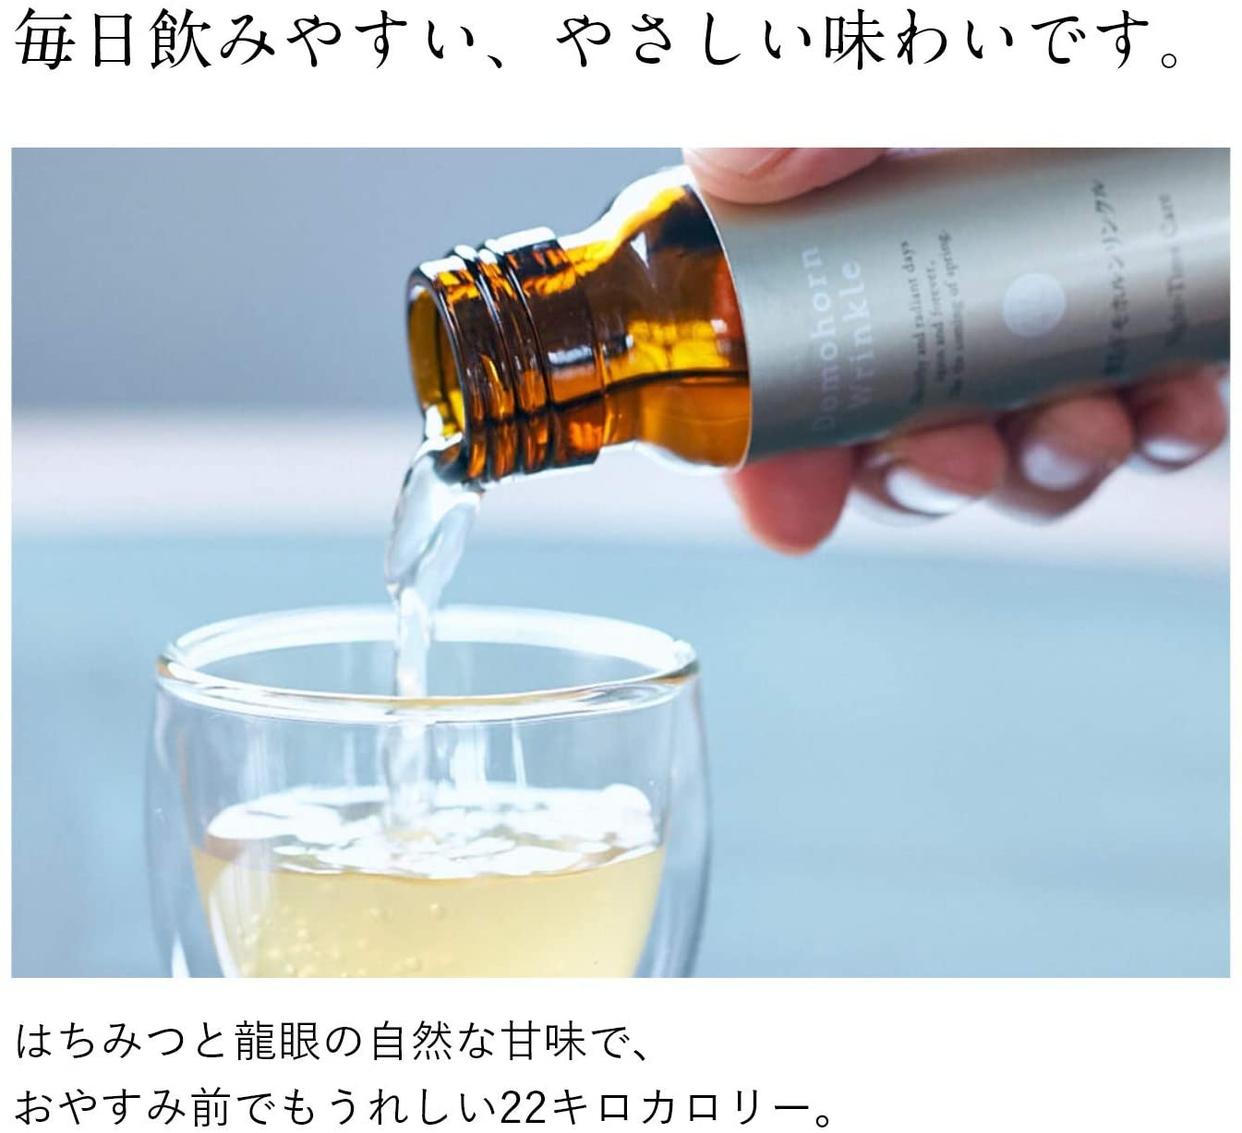 Domohorn Wrinkle(ドモホルンリンクル) 飲むドモホルンリンクルの商品画像8